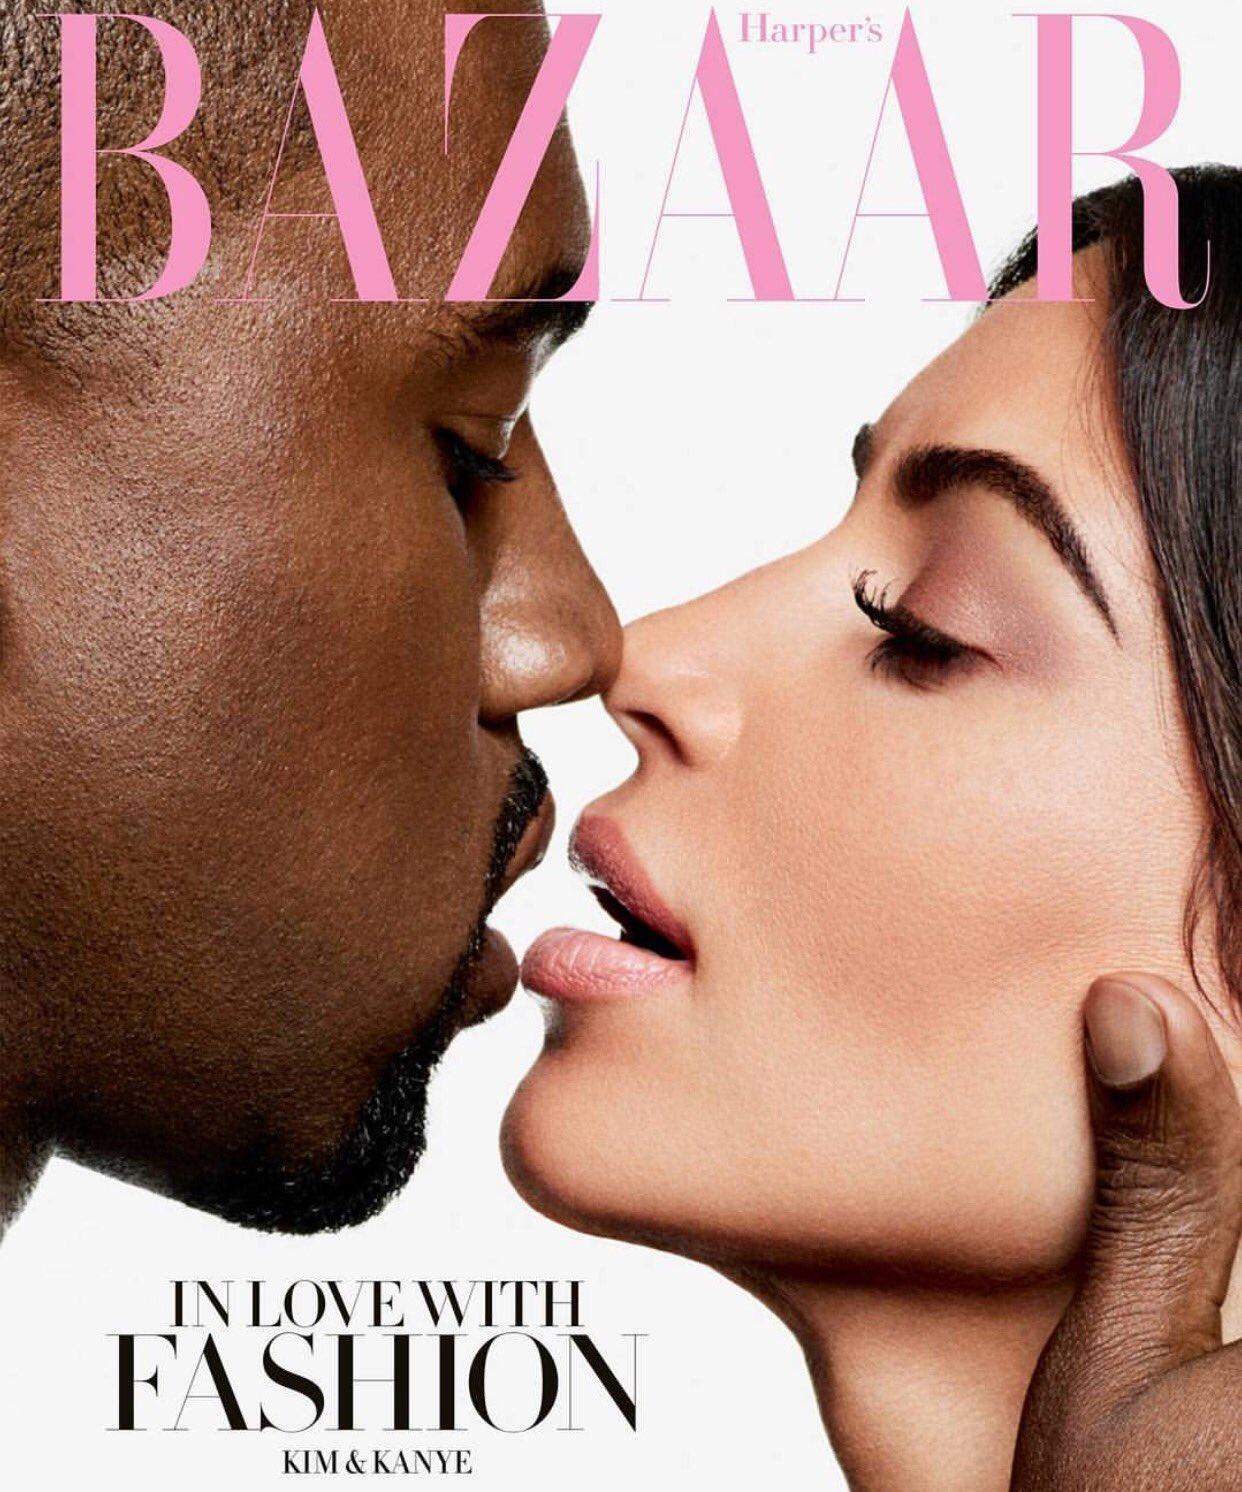 Unbelievably beautiful cover of @harpersbazaarus shot by our friend @karllagerfeld!! @kimkardashian #KanyeWest https://t.co/ZClfERhoi3